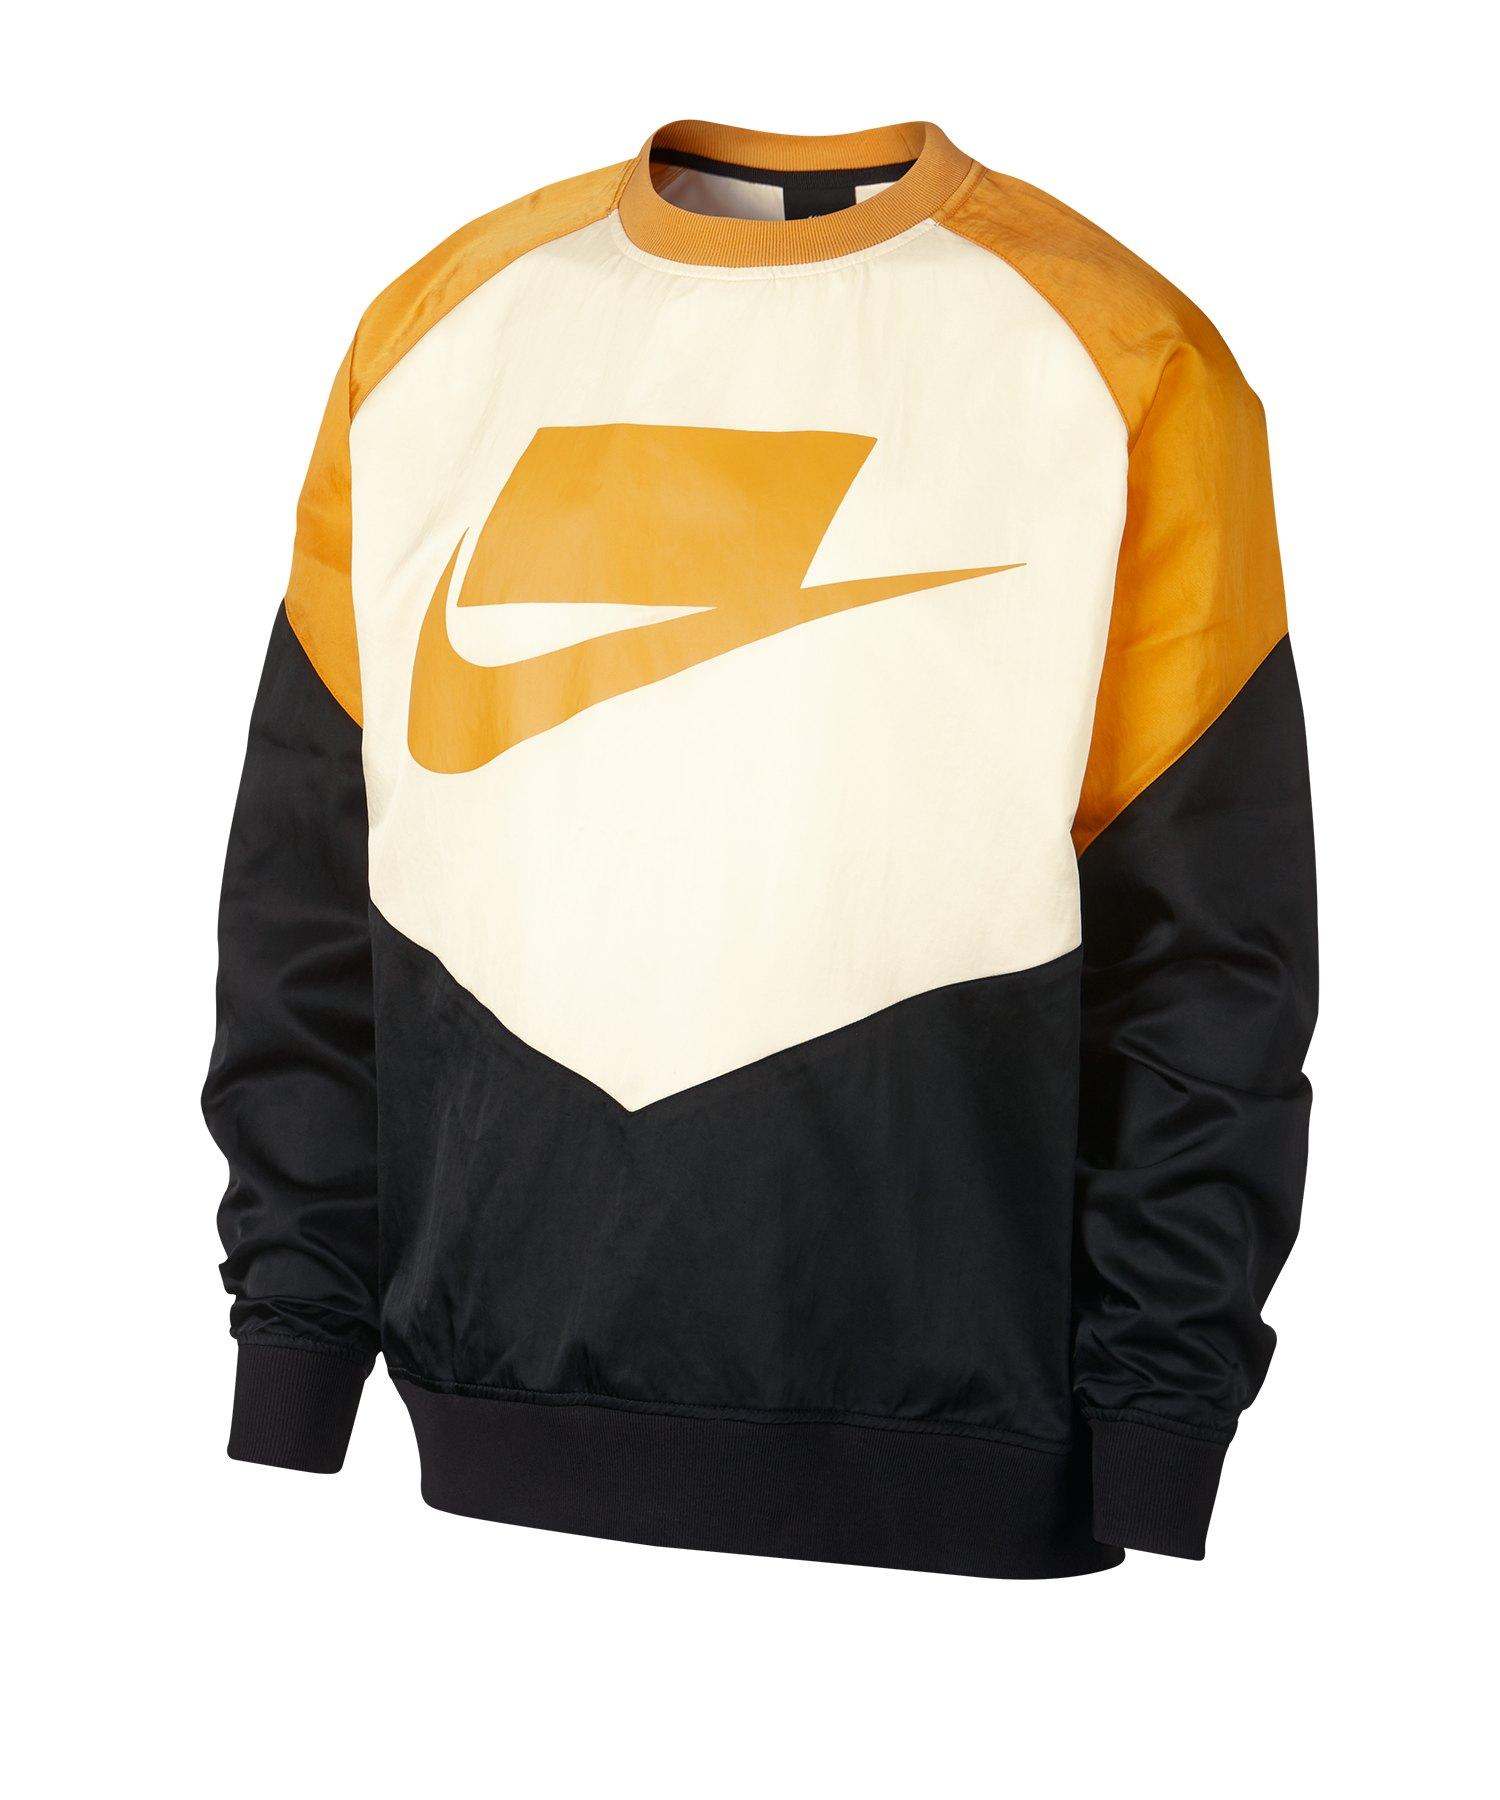 Nike Crew Woven Sweatshirt Schwarz Gelb F010 - Schwarz